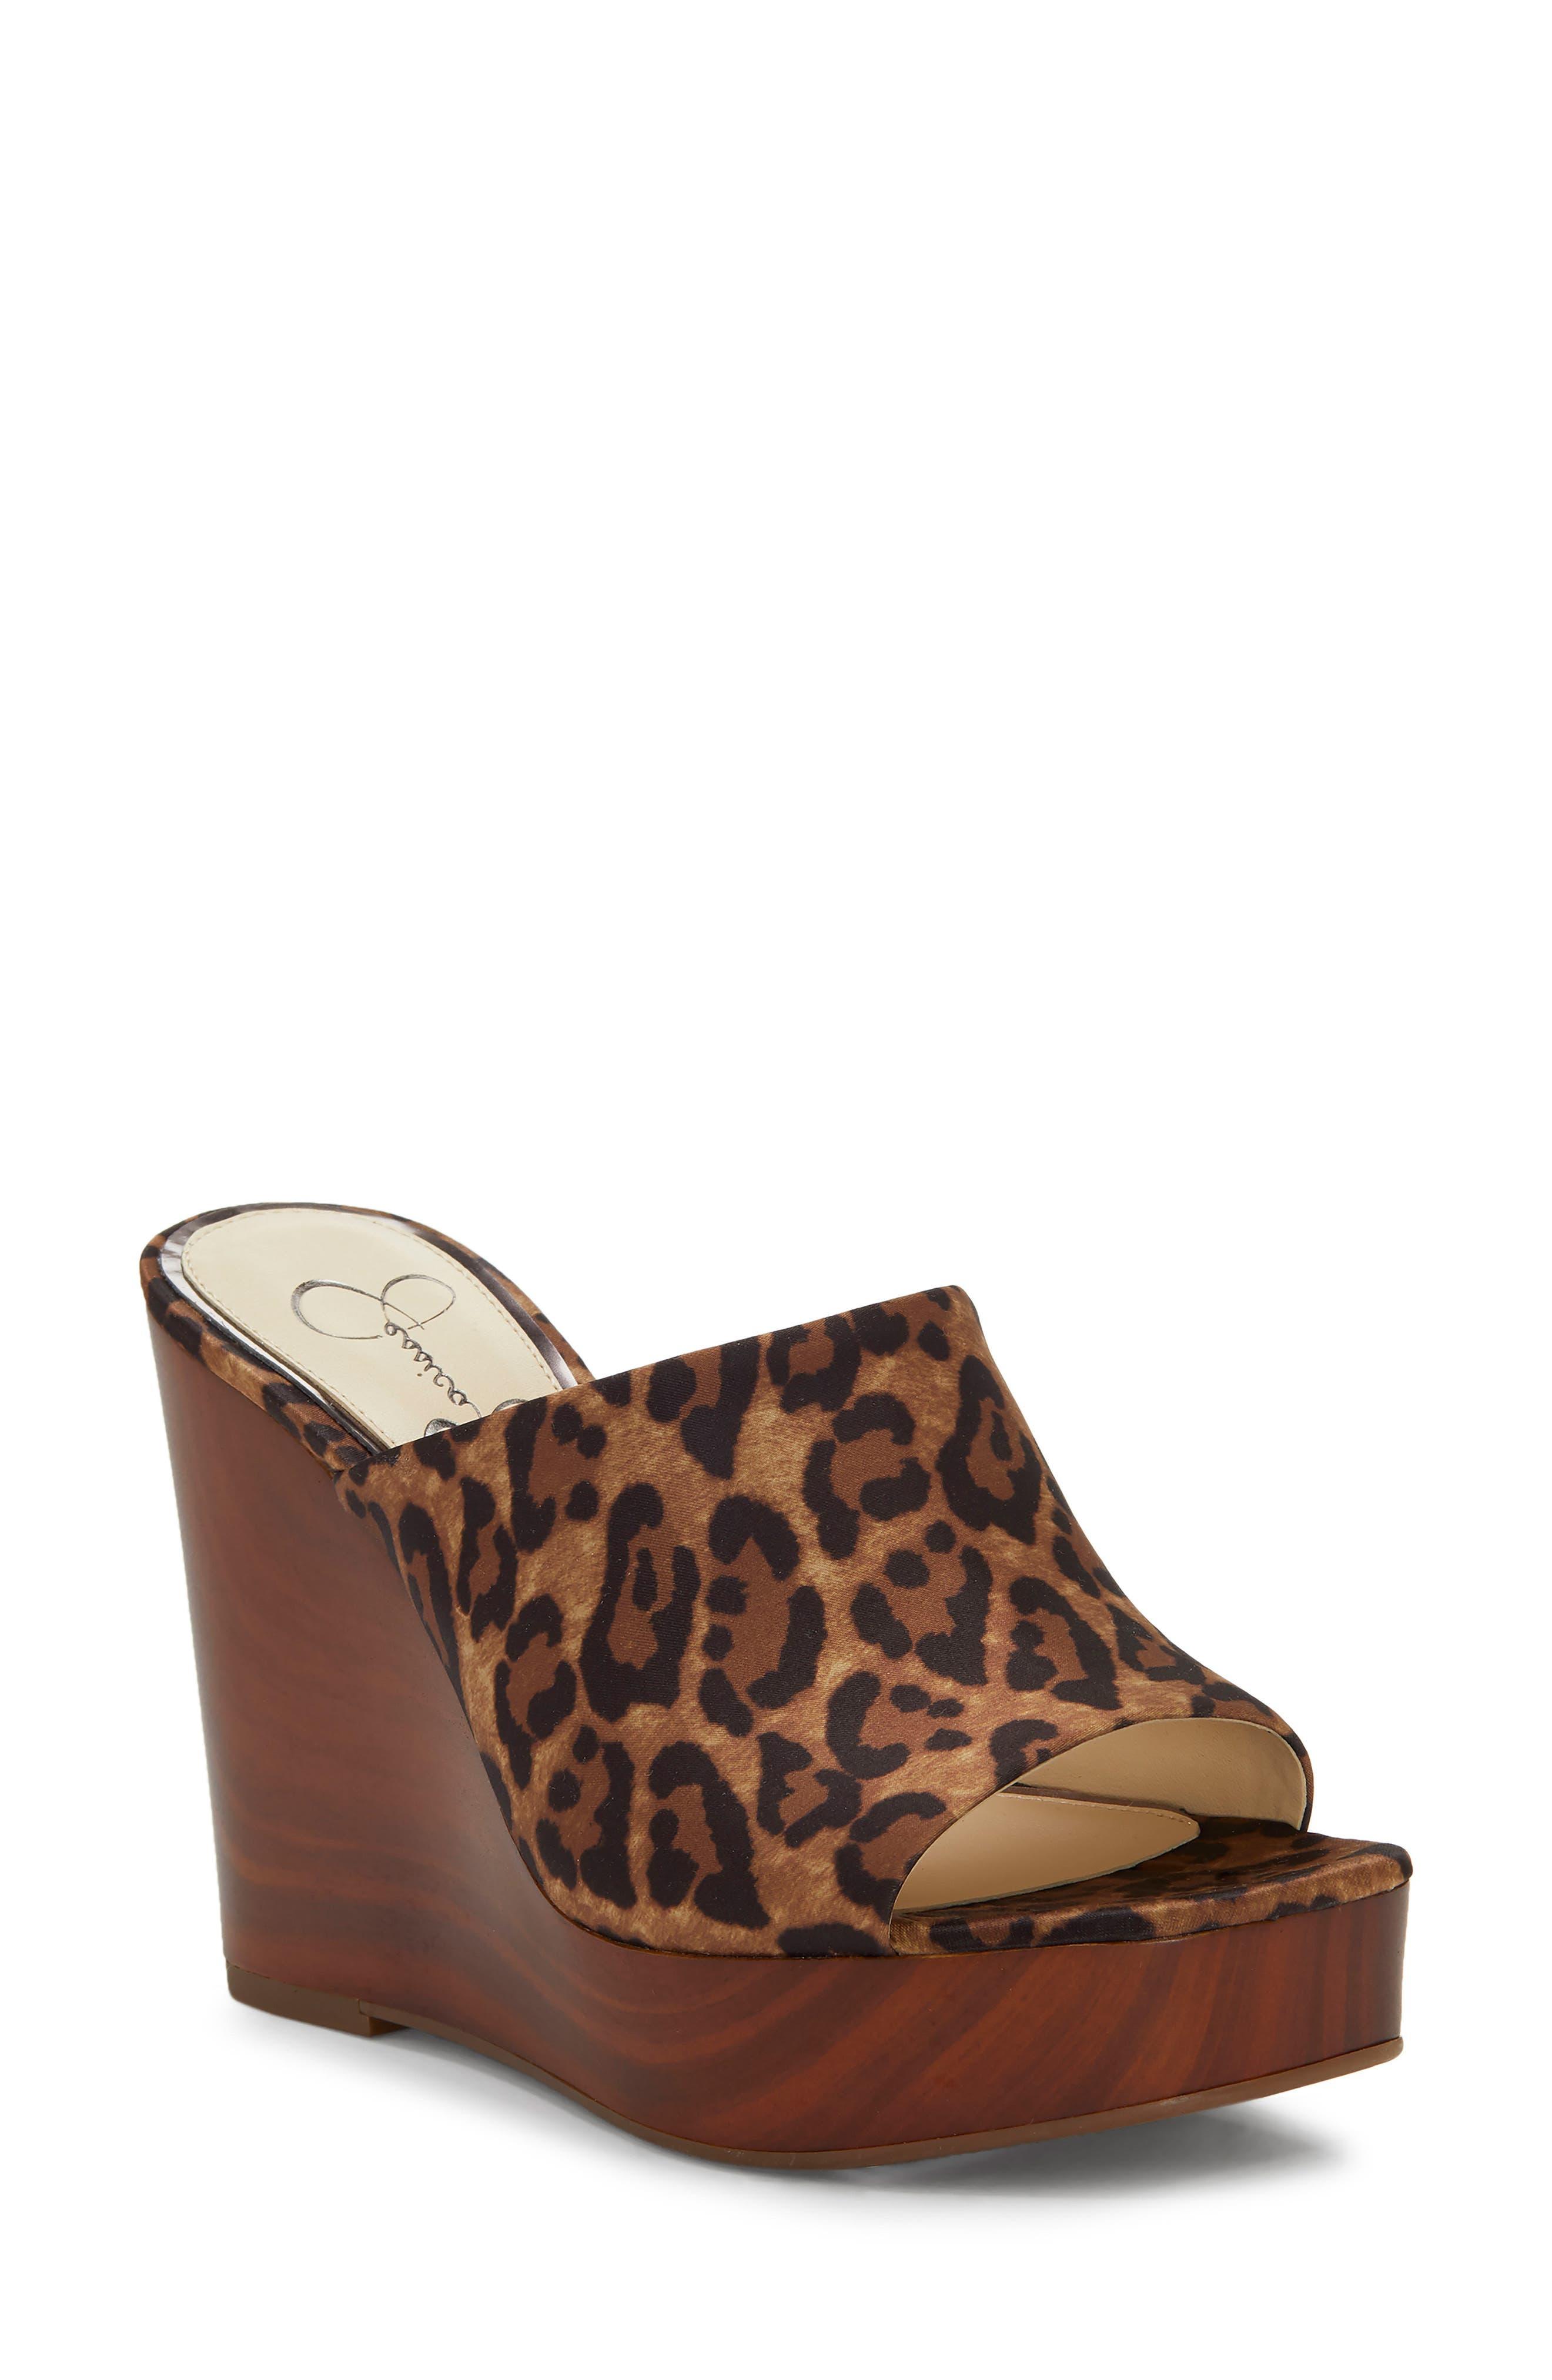 Jessica Simpson Shantelle Wedge Slide Sandal- Beige